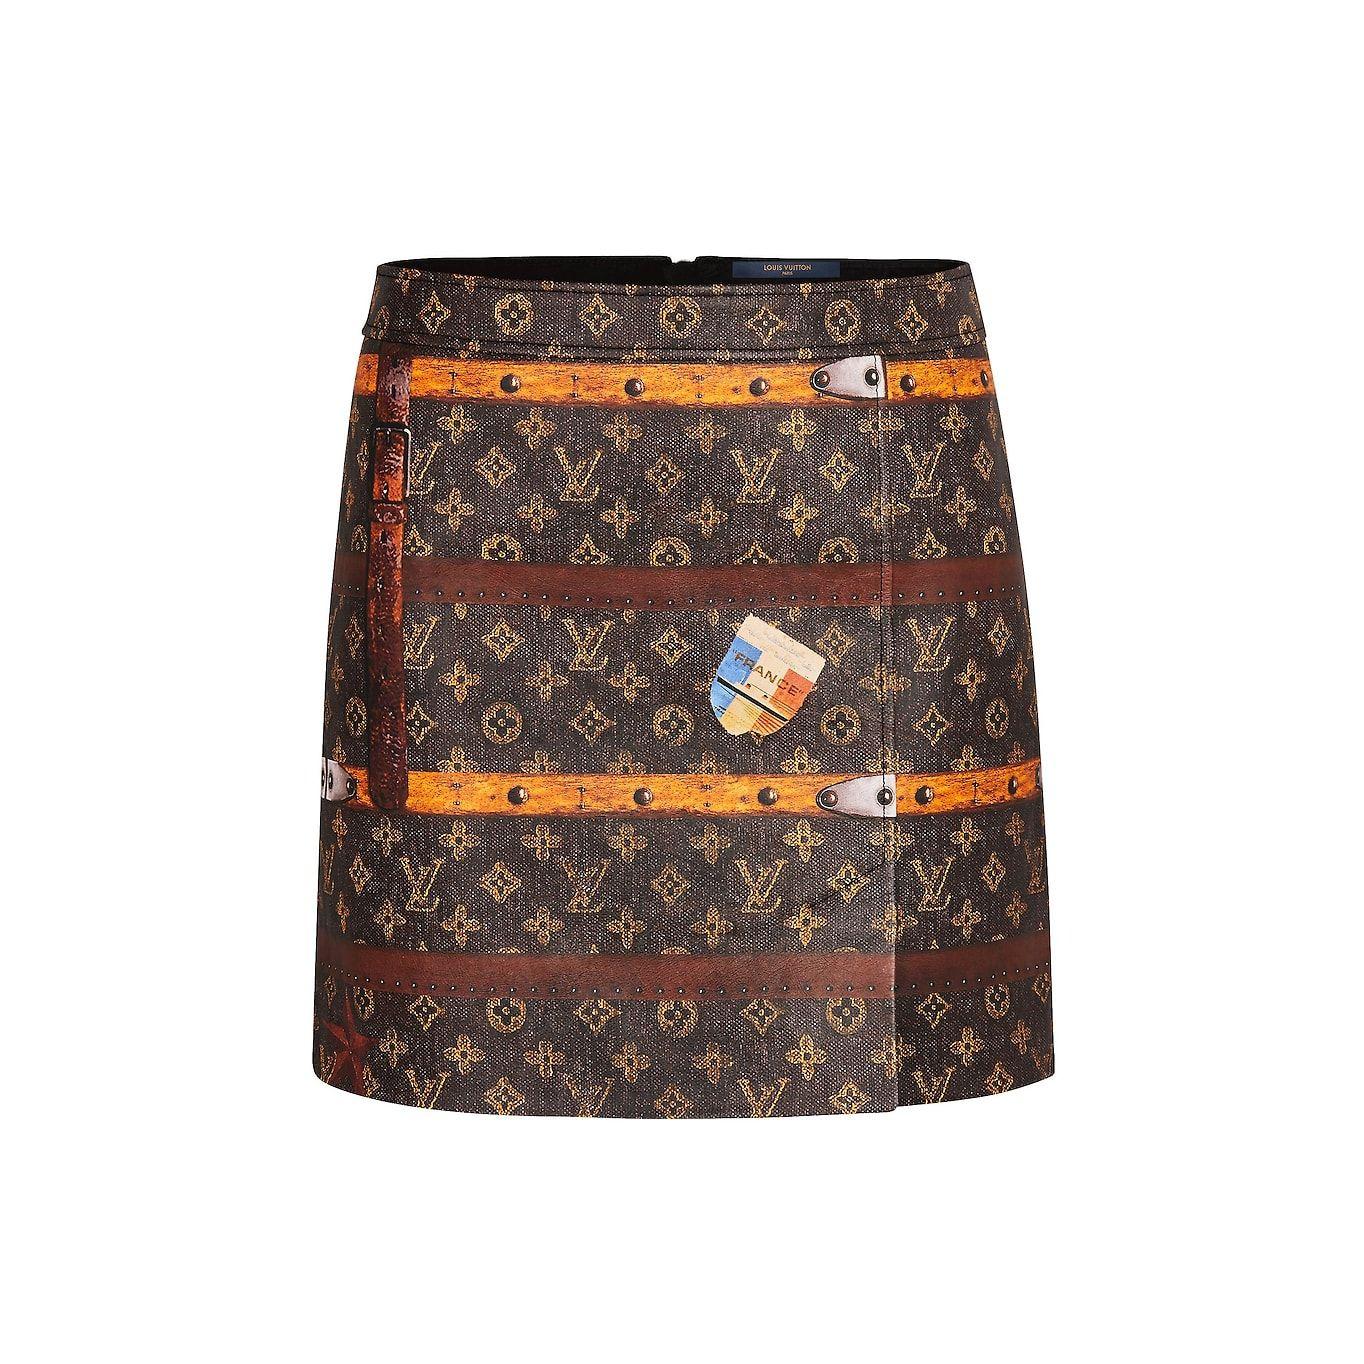 Louis Vuitton Trunk print leather mini skirt (4,250